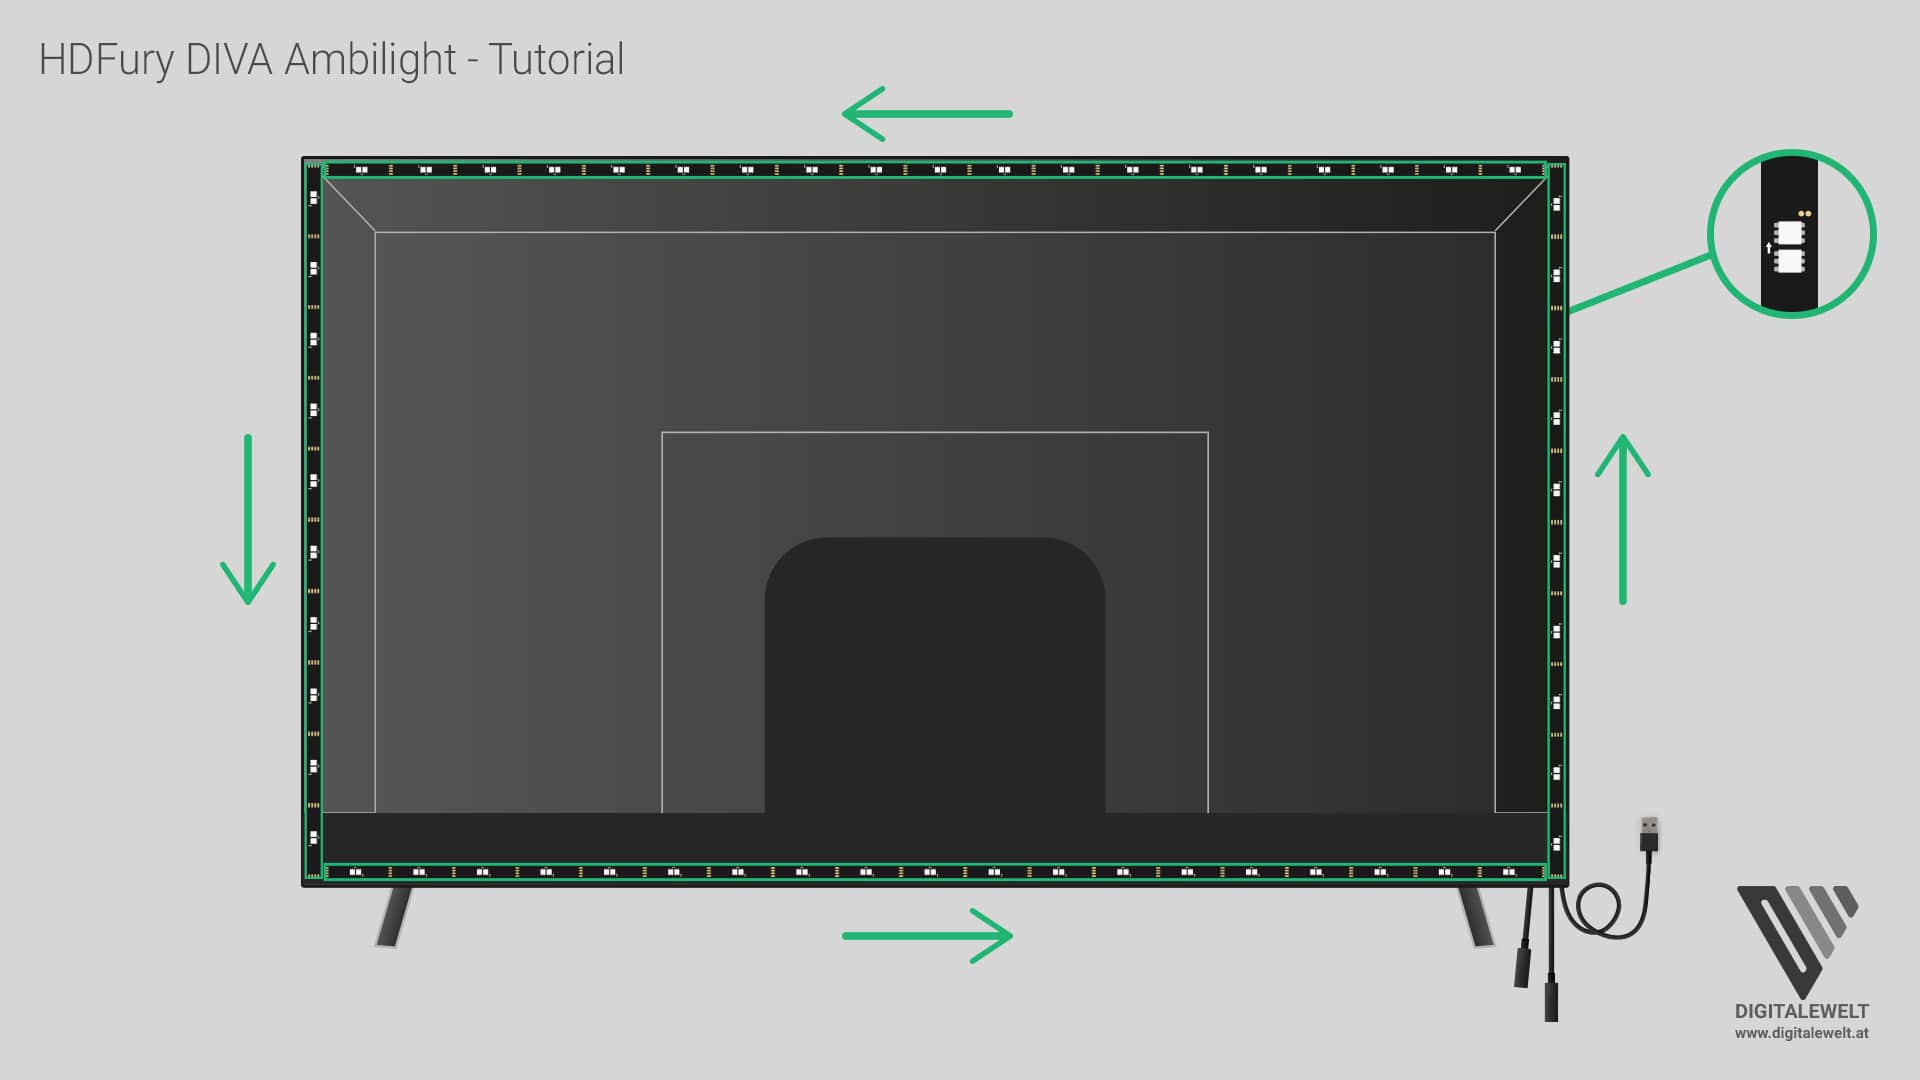 HDFury DIVA Ambilight - Richtung LED-Streifen - digitalewelt.at